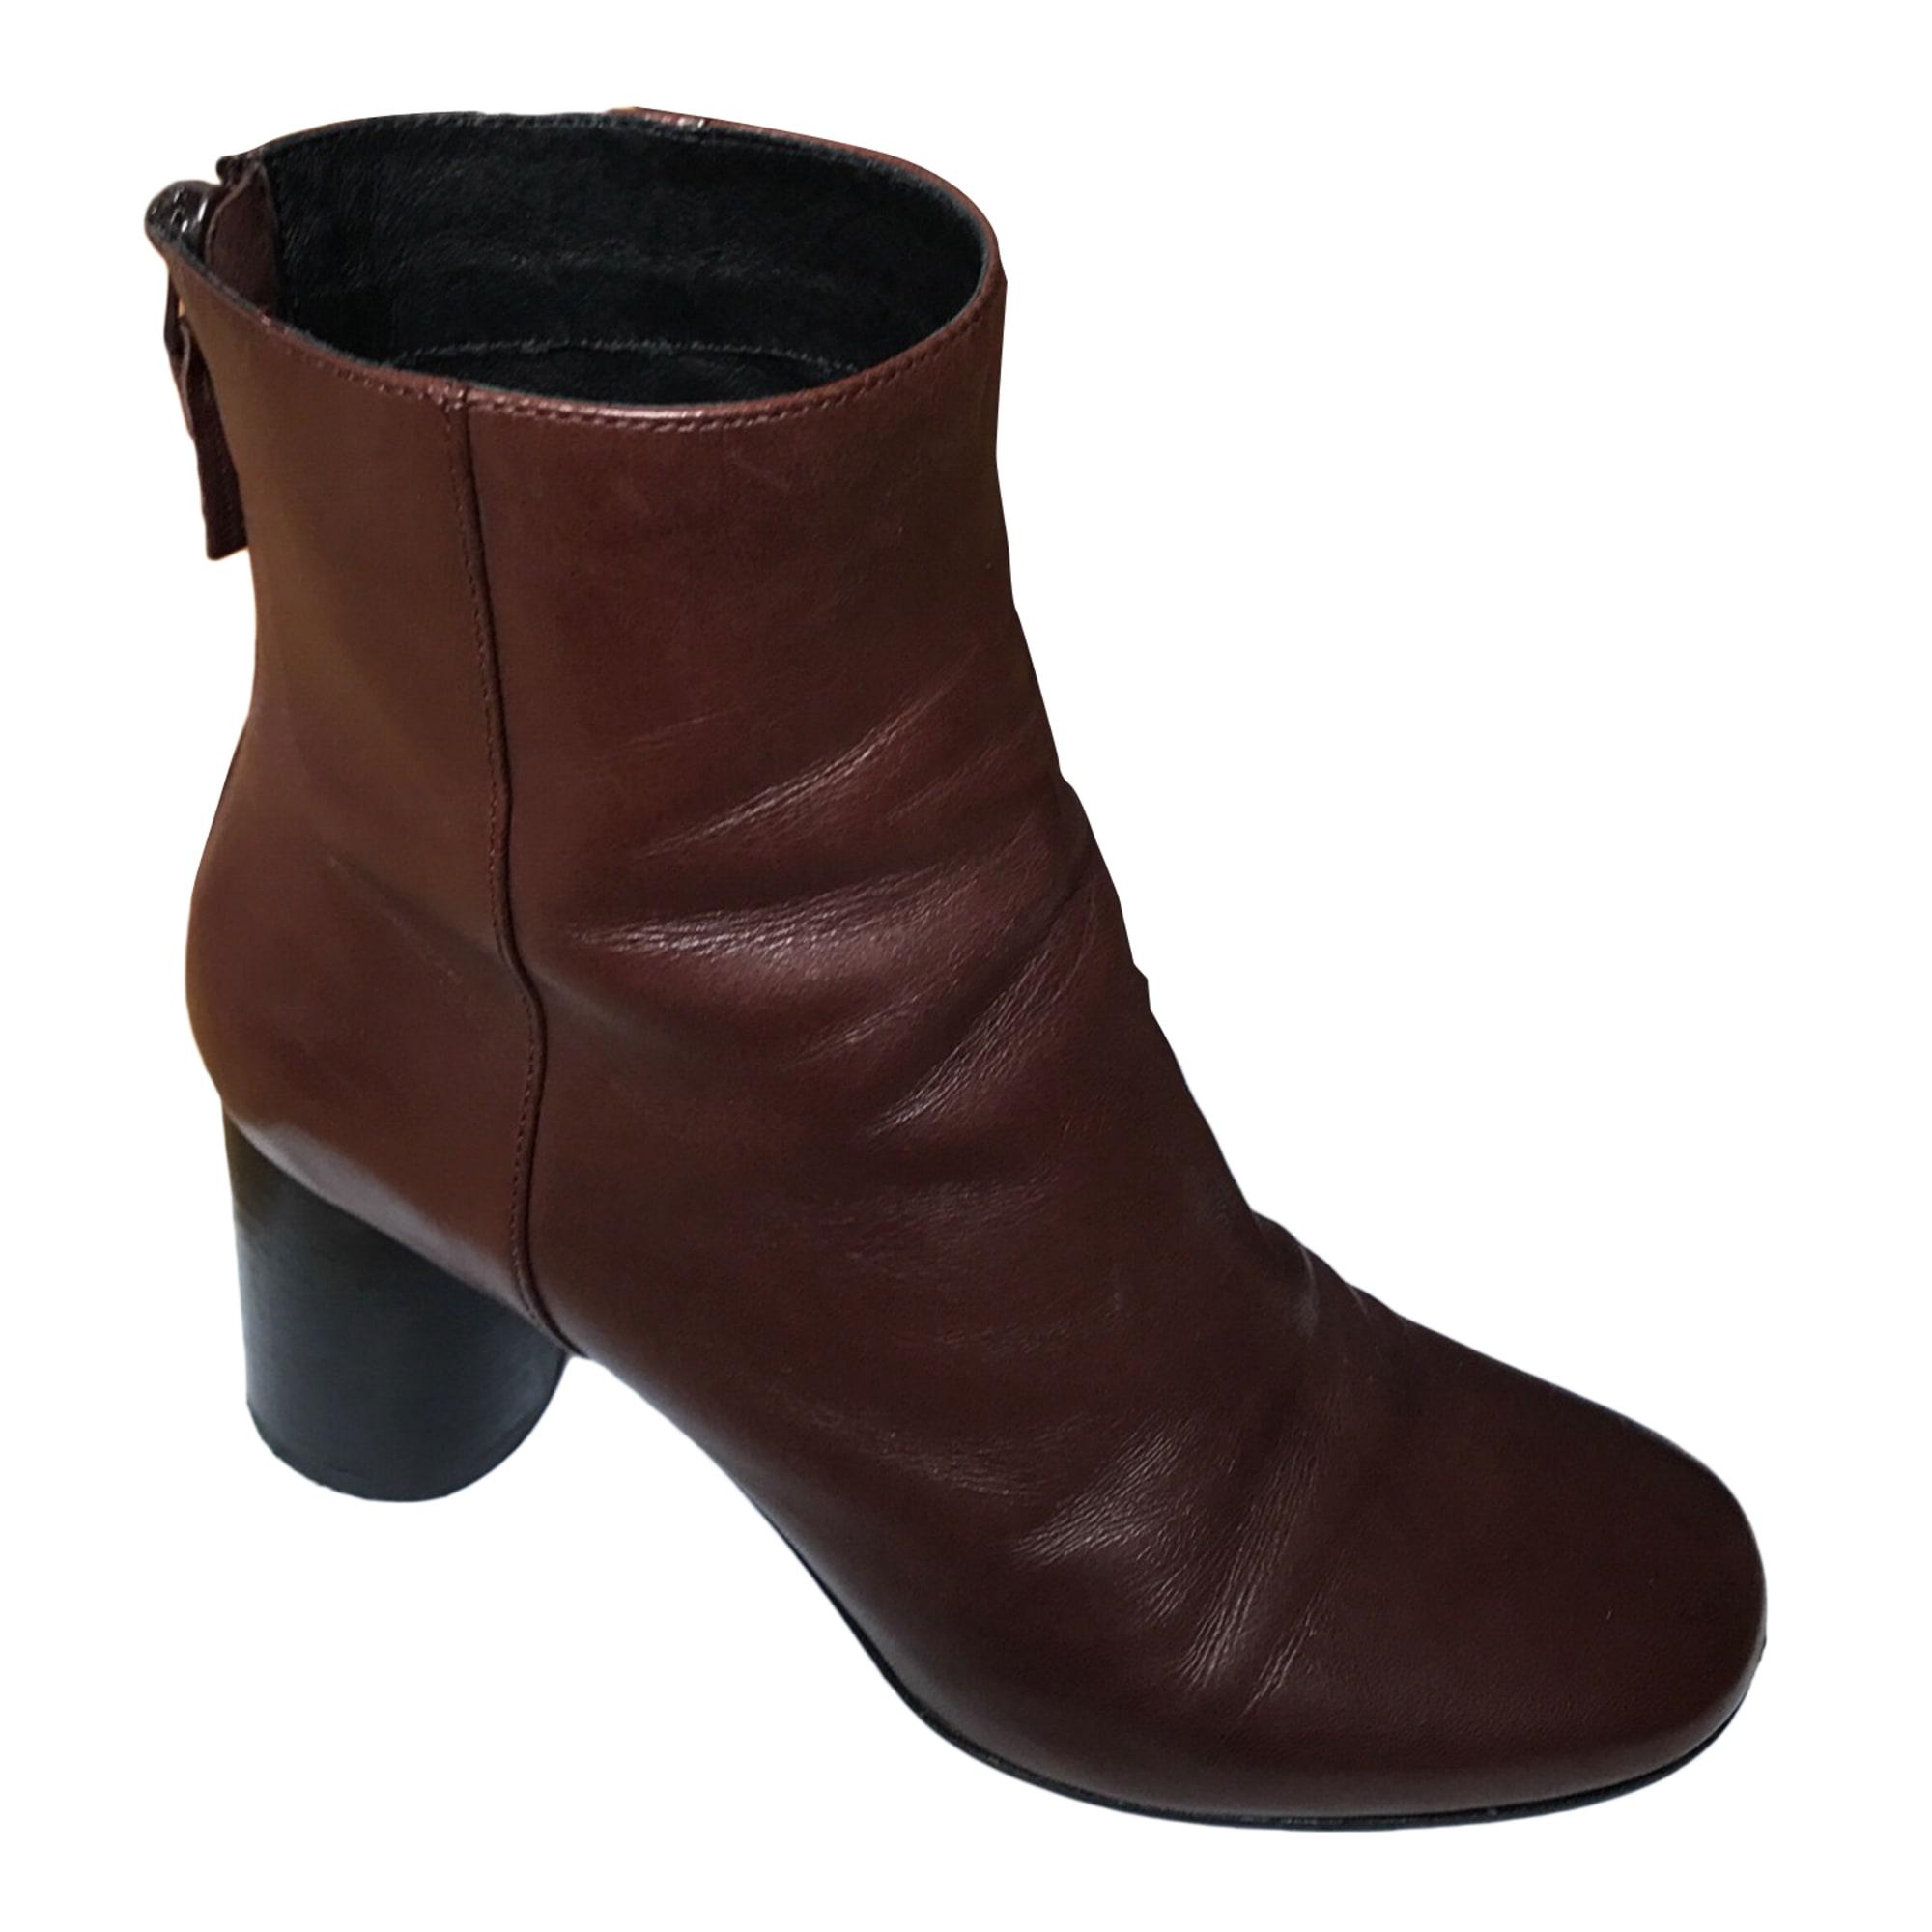 Bottineslow talons à Bottineslow talons boots boots Bottineslow boots à talons à 5FJlK3uT1c